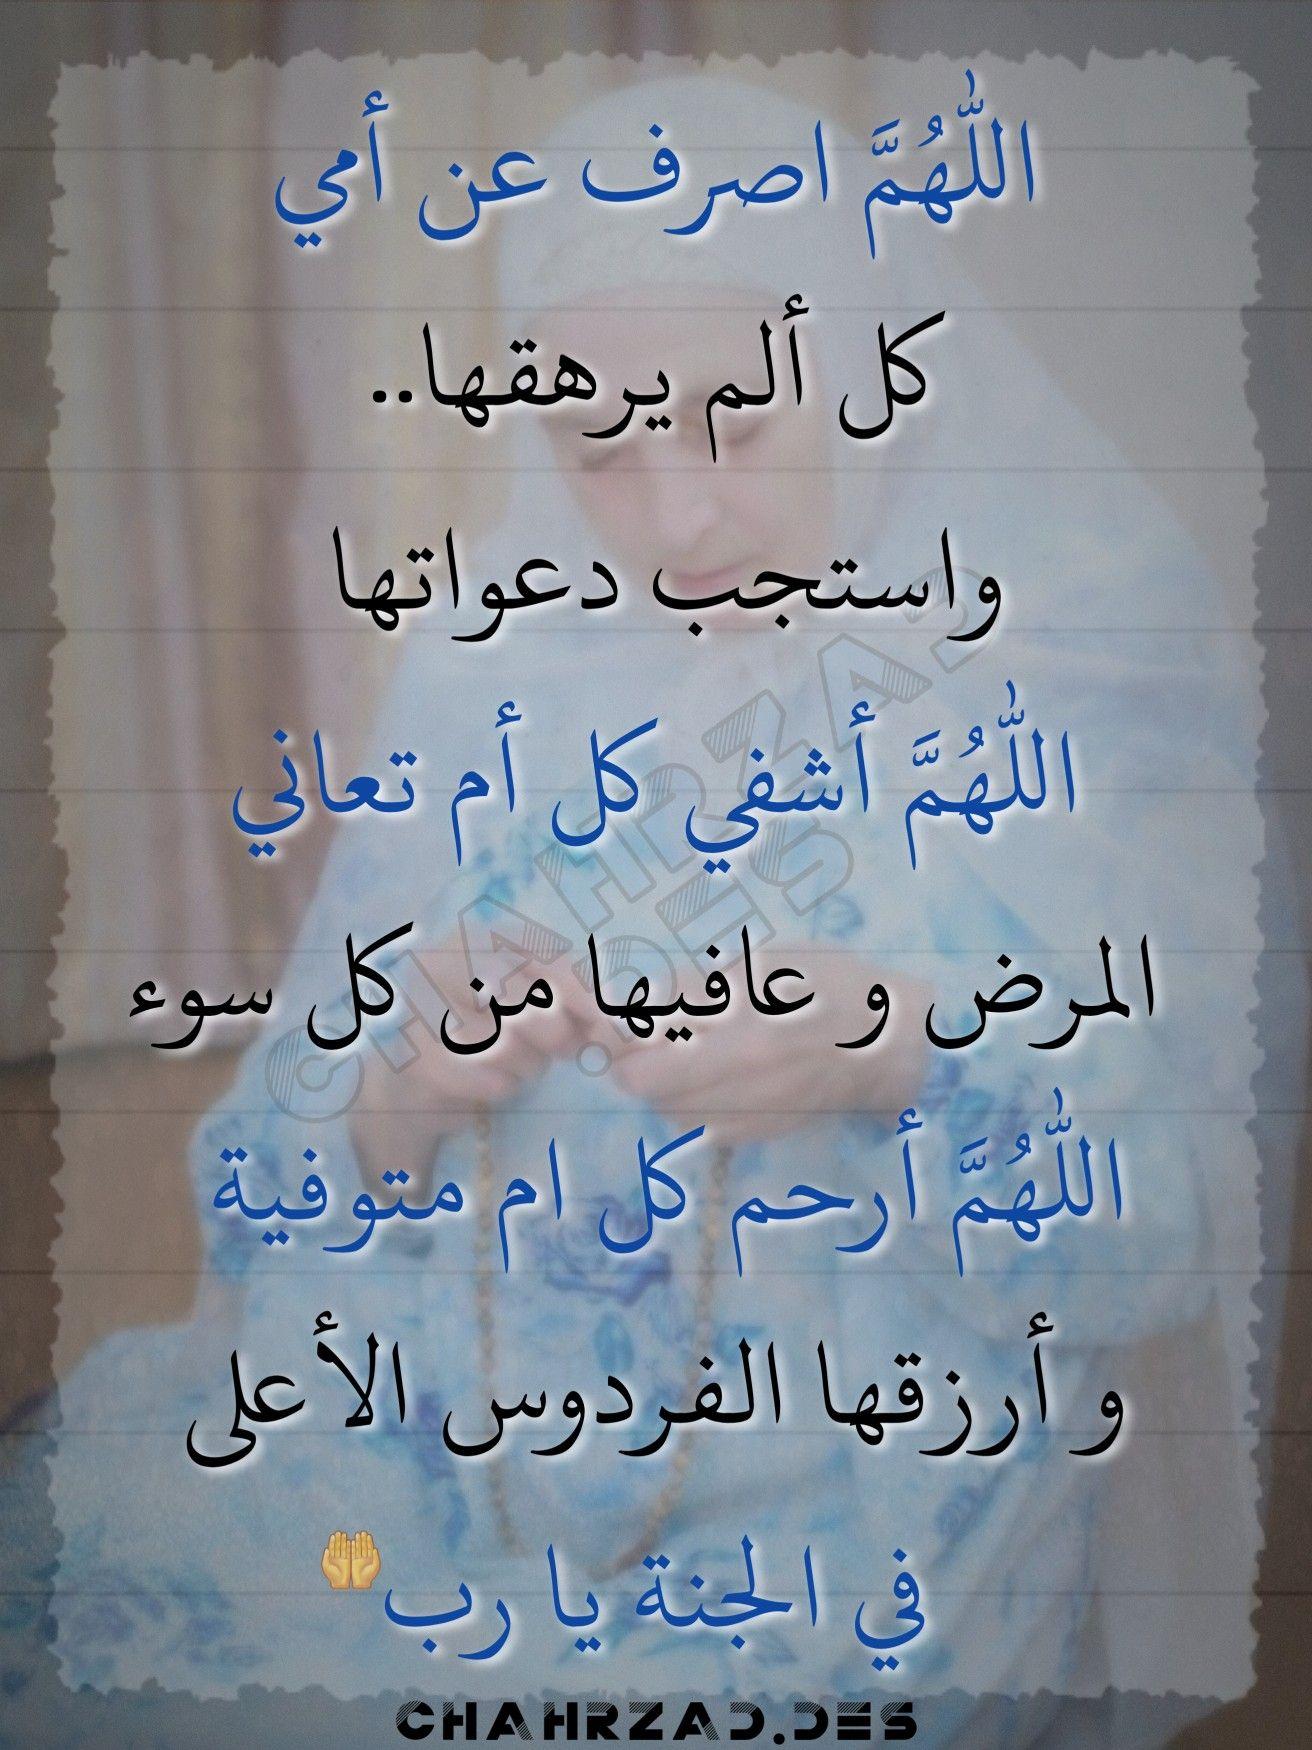 Pin By Chahrazad Mohamed On دعاء تصميمي Iphone Wallpaper Math Wallpaper